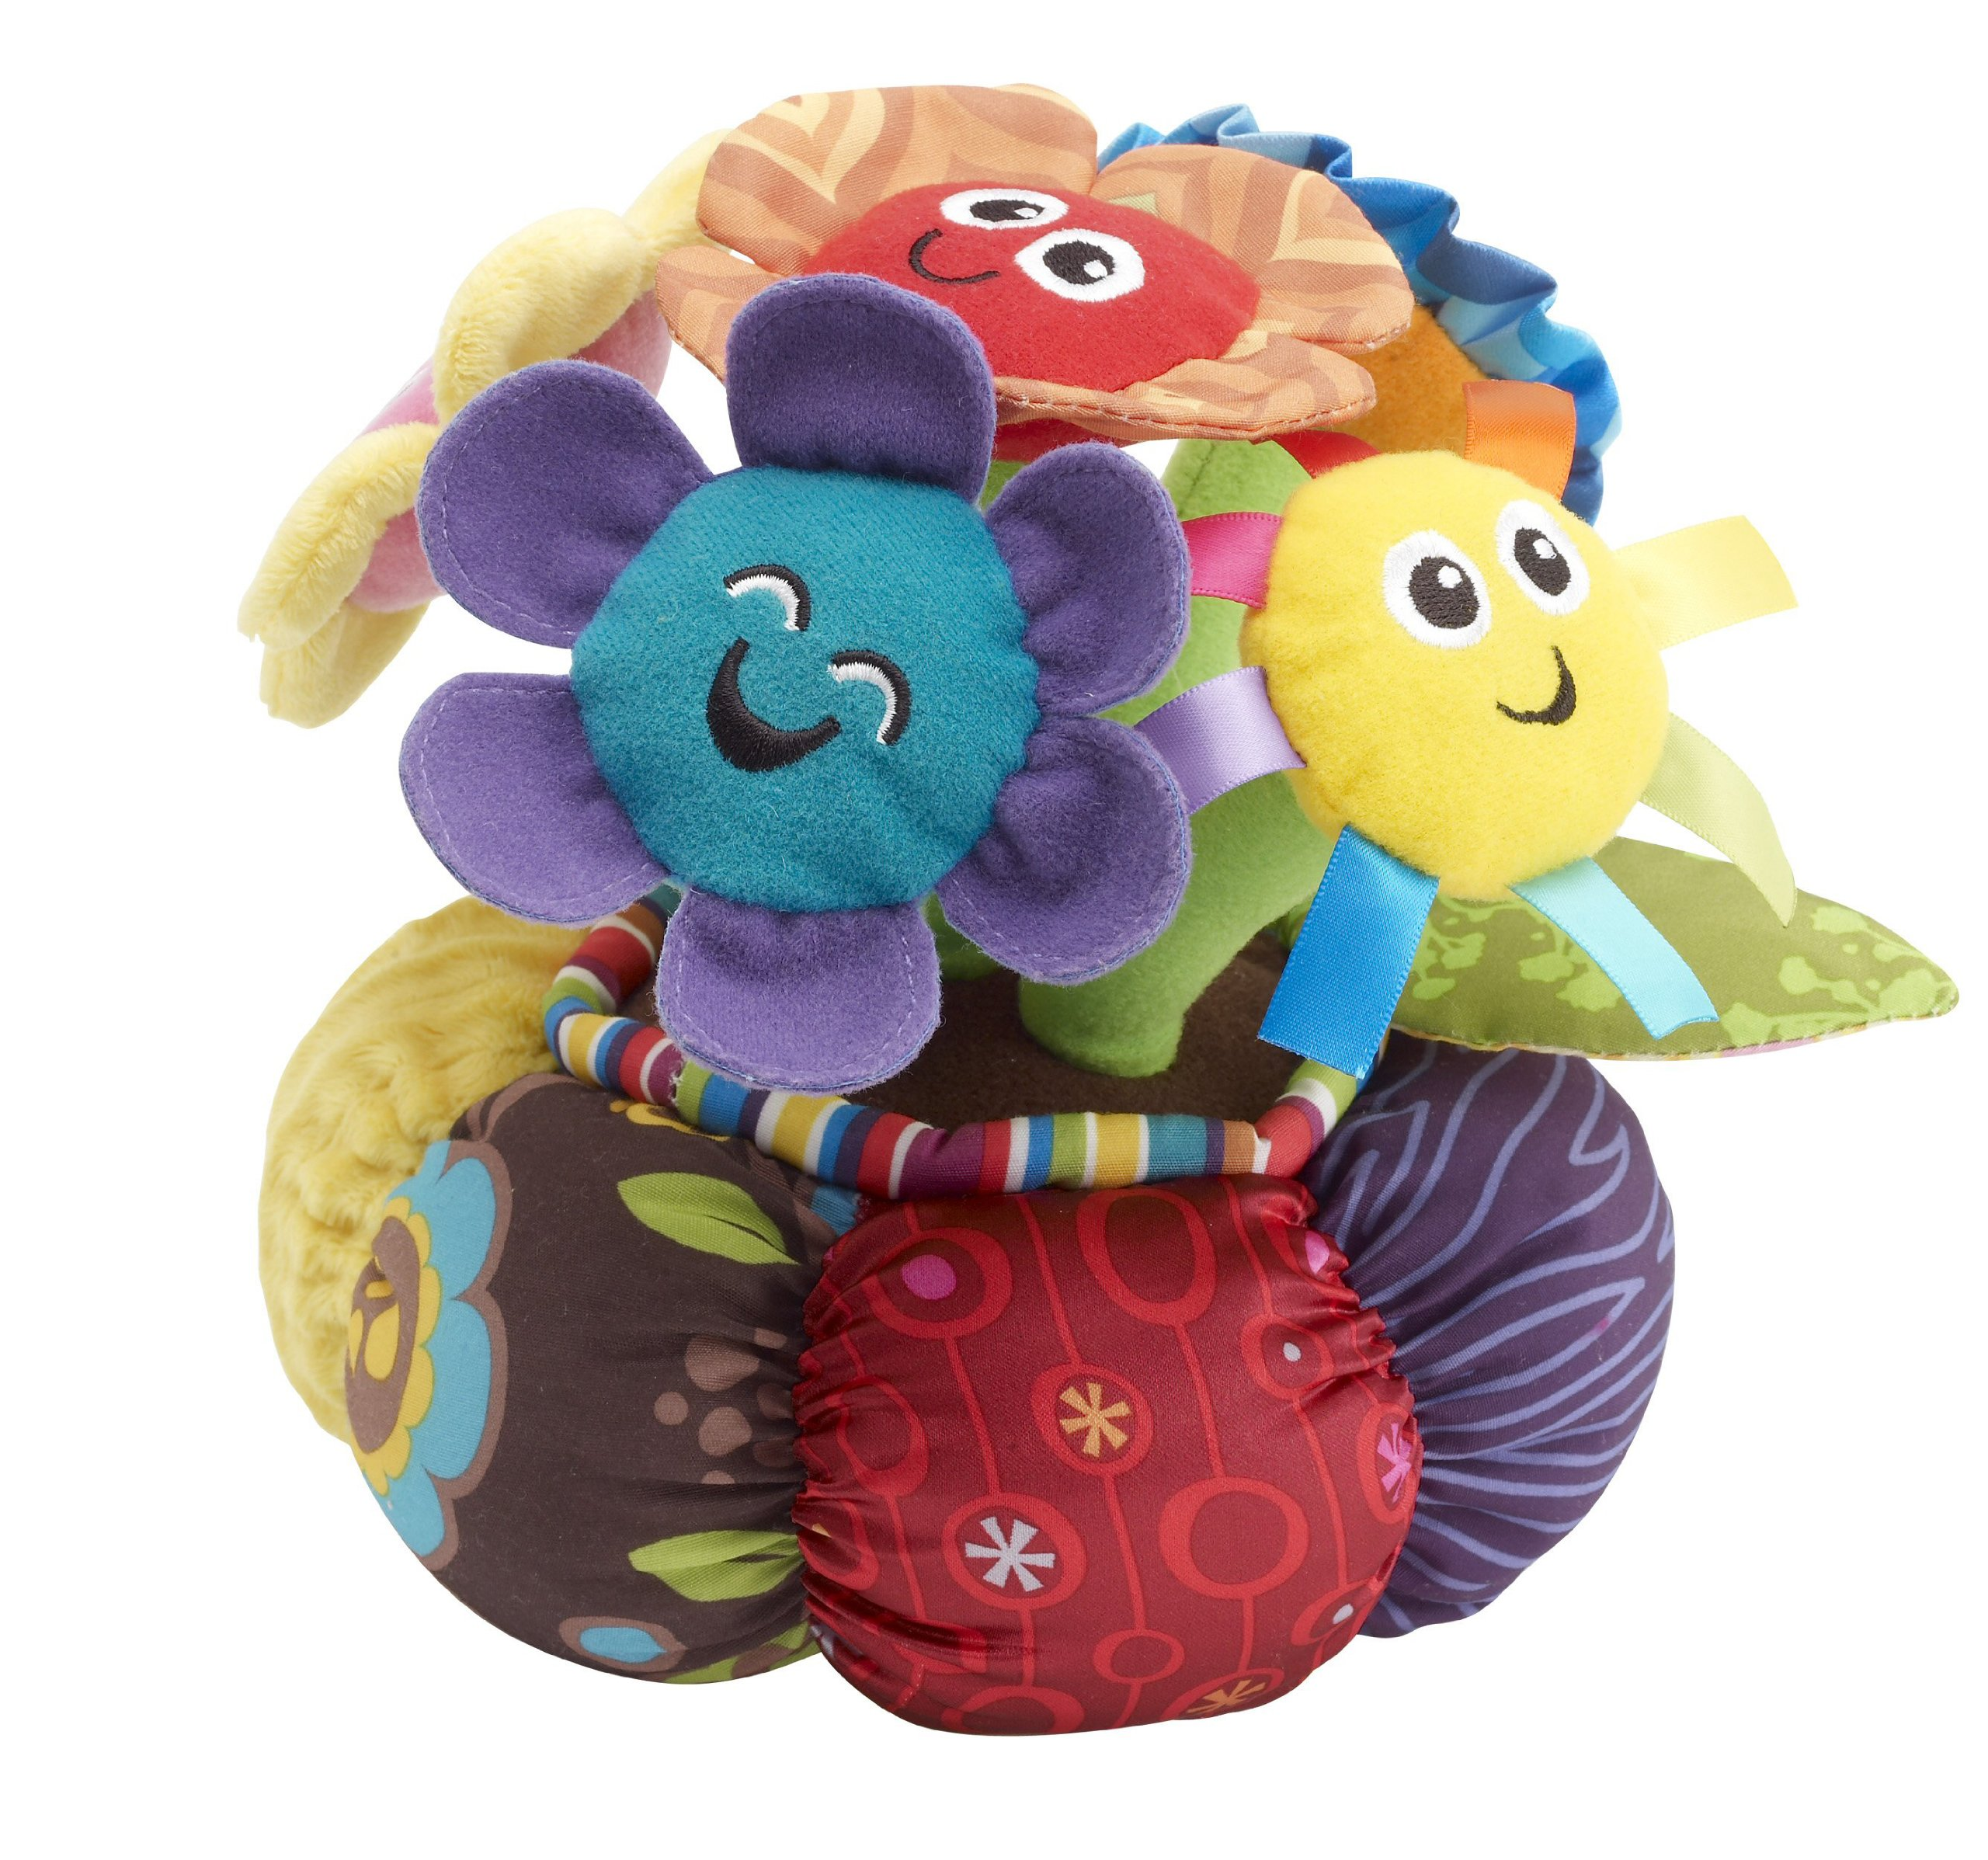 Lamaze Soft Chime Garden Sc 1 St Alibaba  sc 1 st  startupinsights.org & Lamaze Flower Pot \u0026